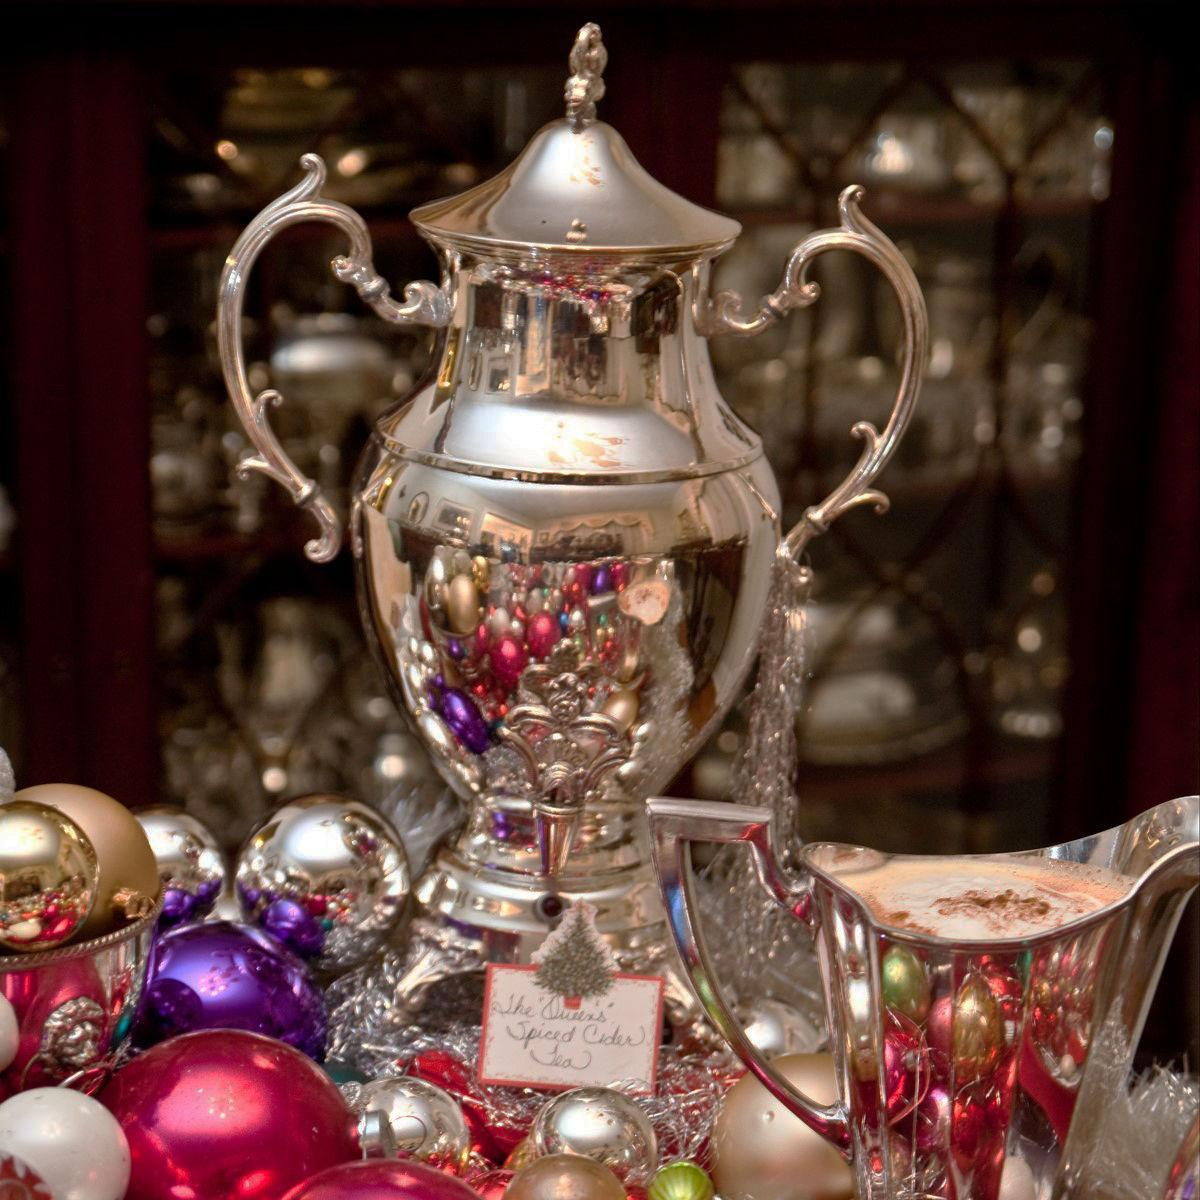 Queen's Spiced Cider Tea